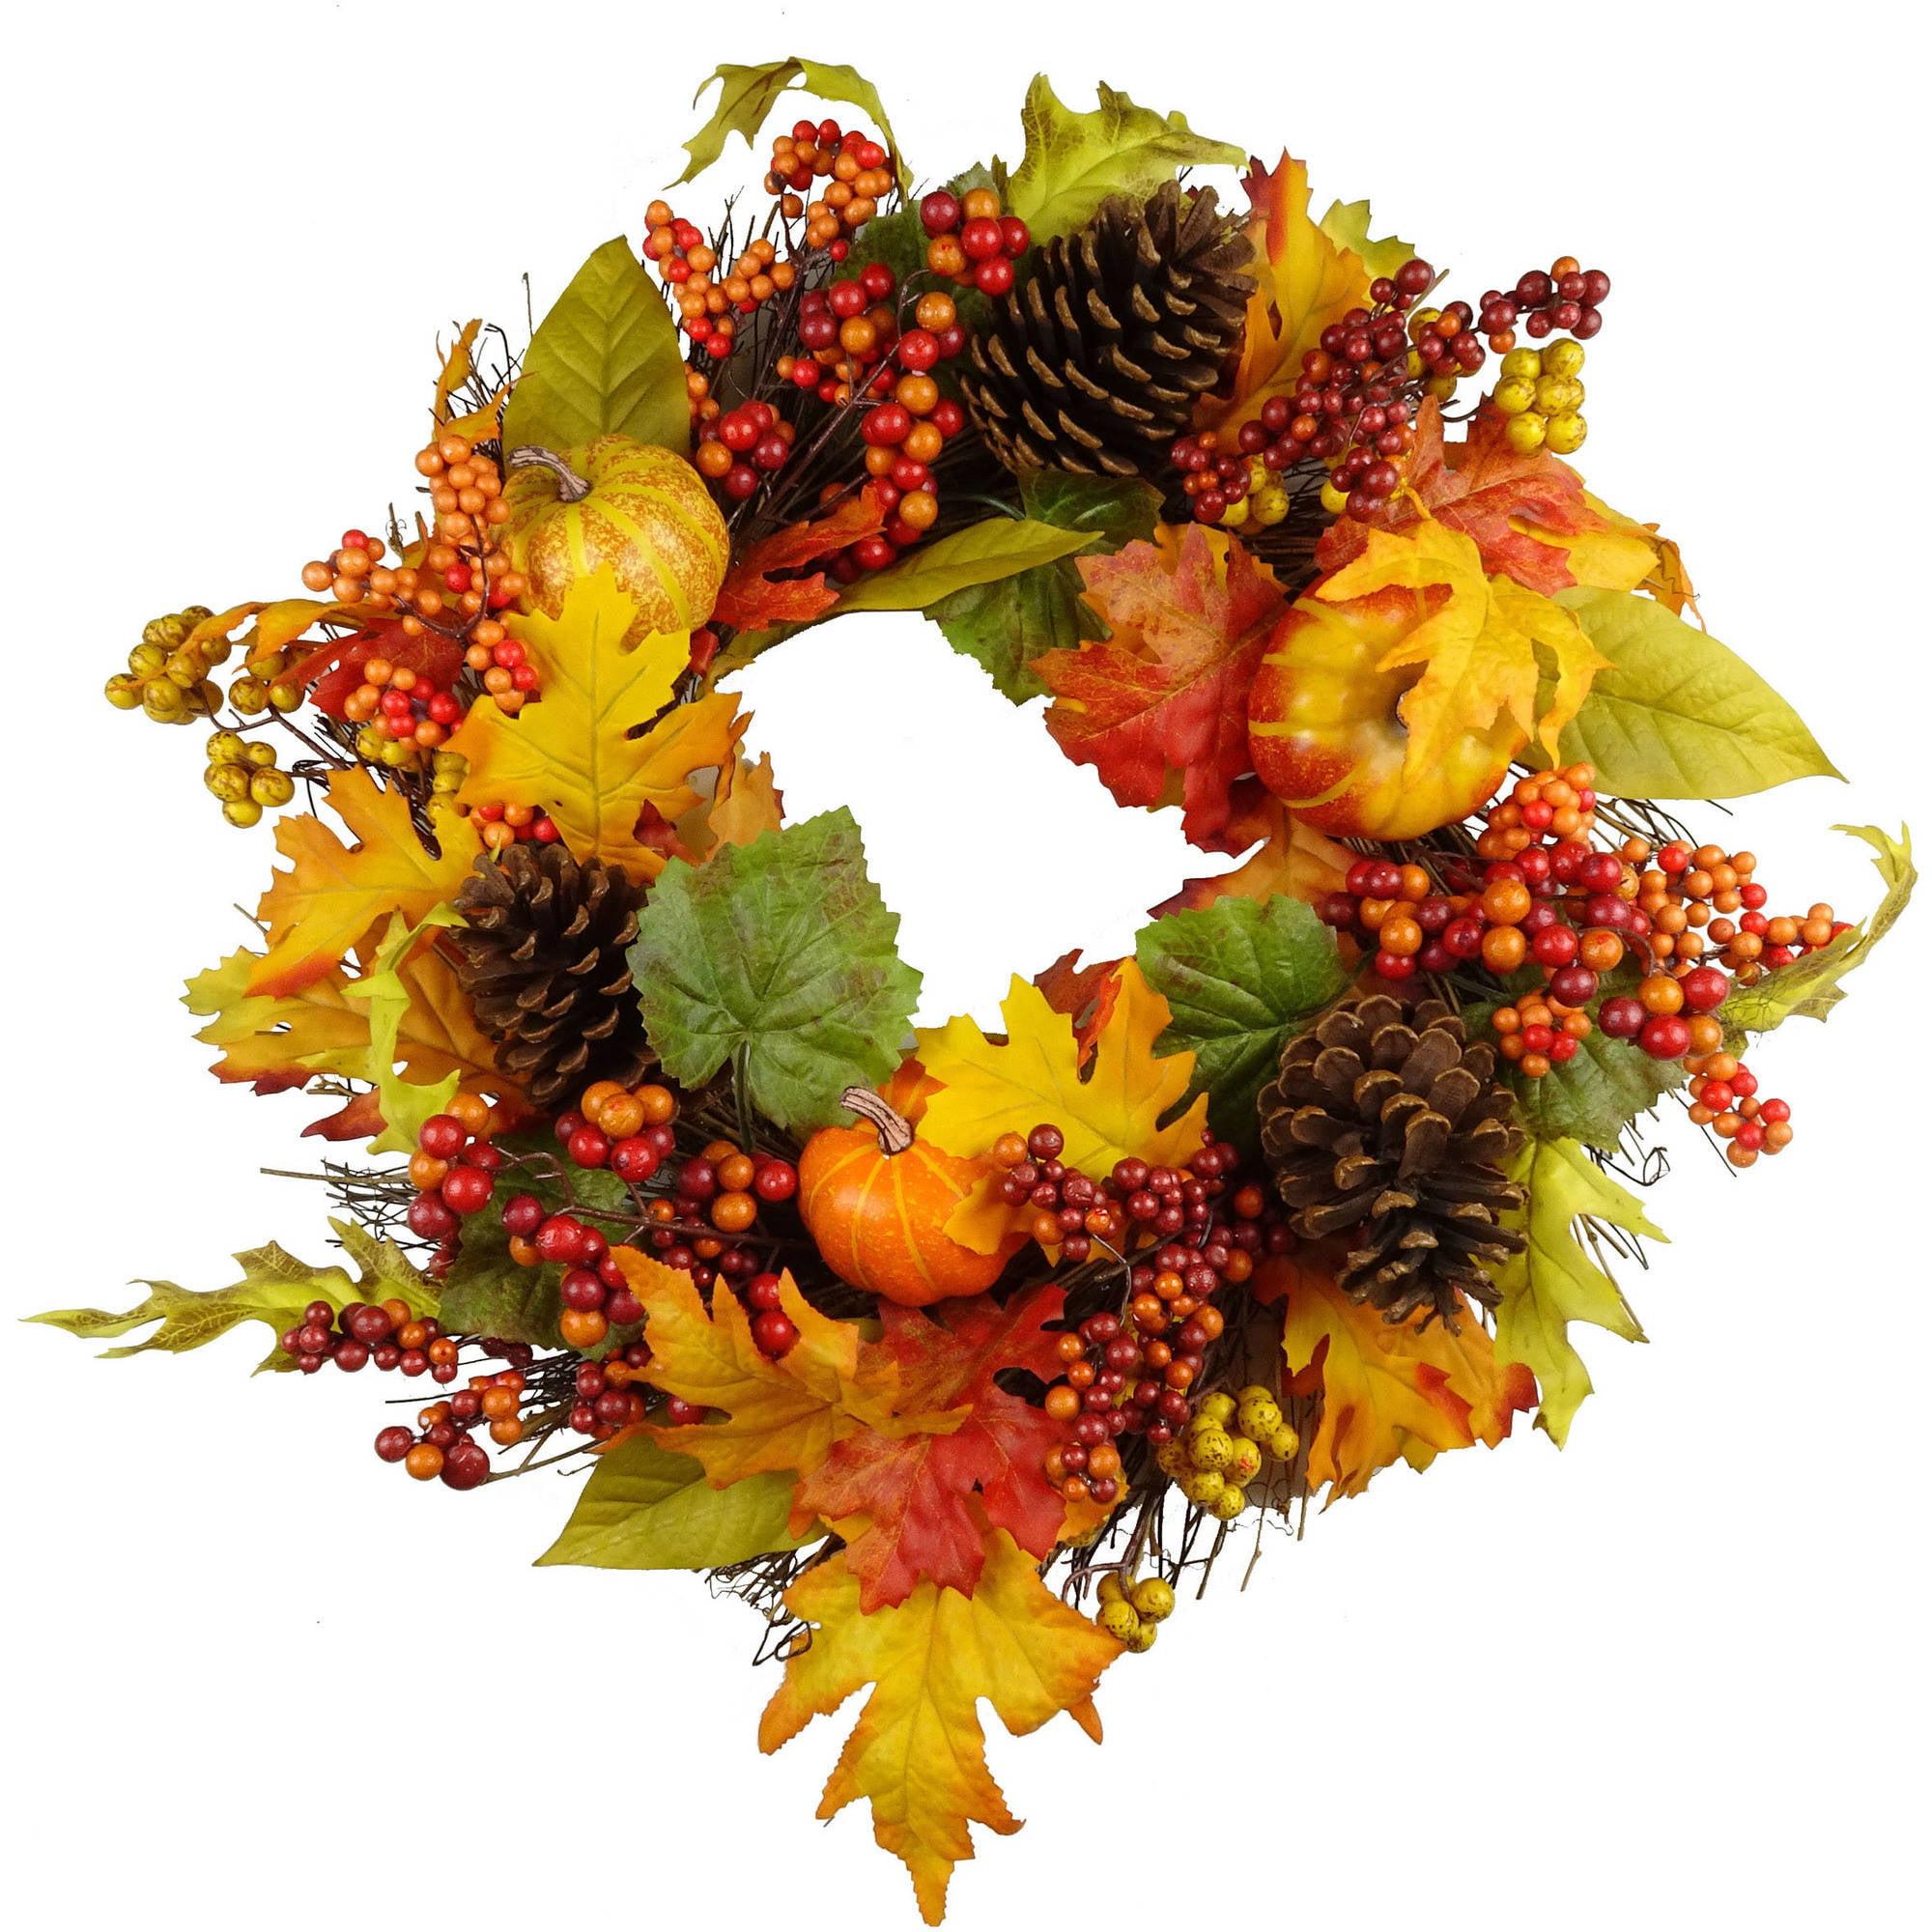 Walmart Halloween Orange Pumpkin  /  Berry Mixed Wreath Fall Harvest Halloween Decoration